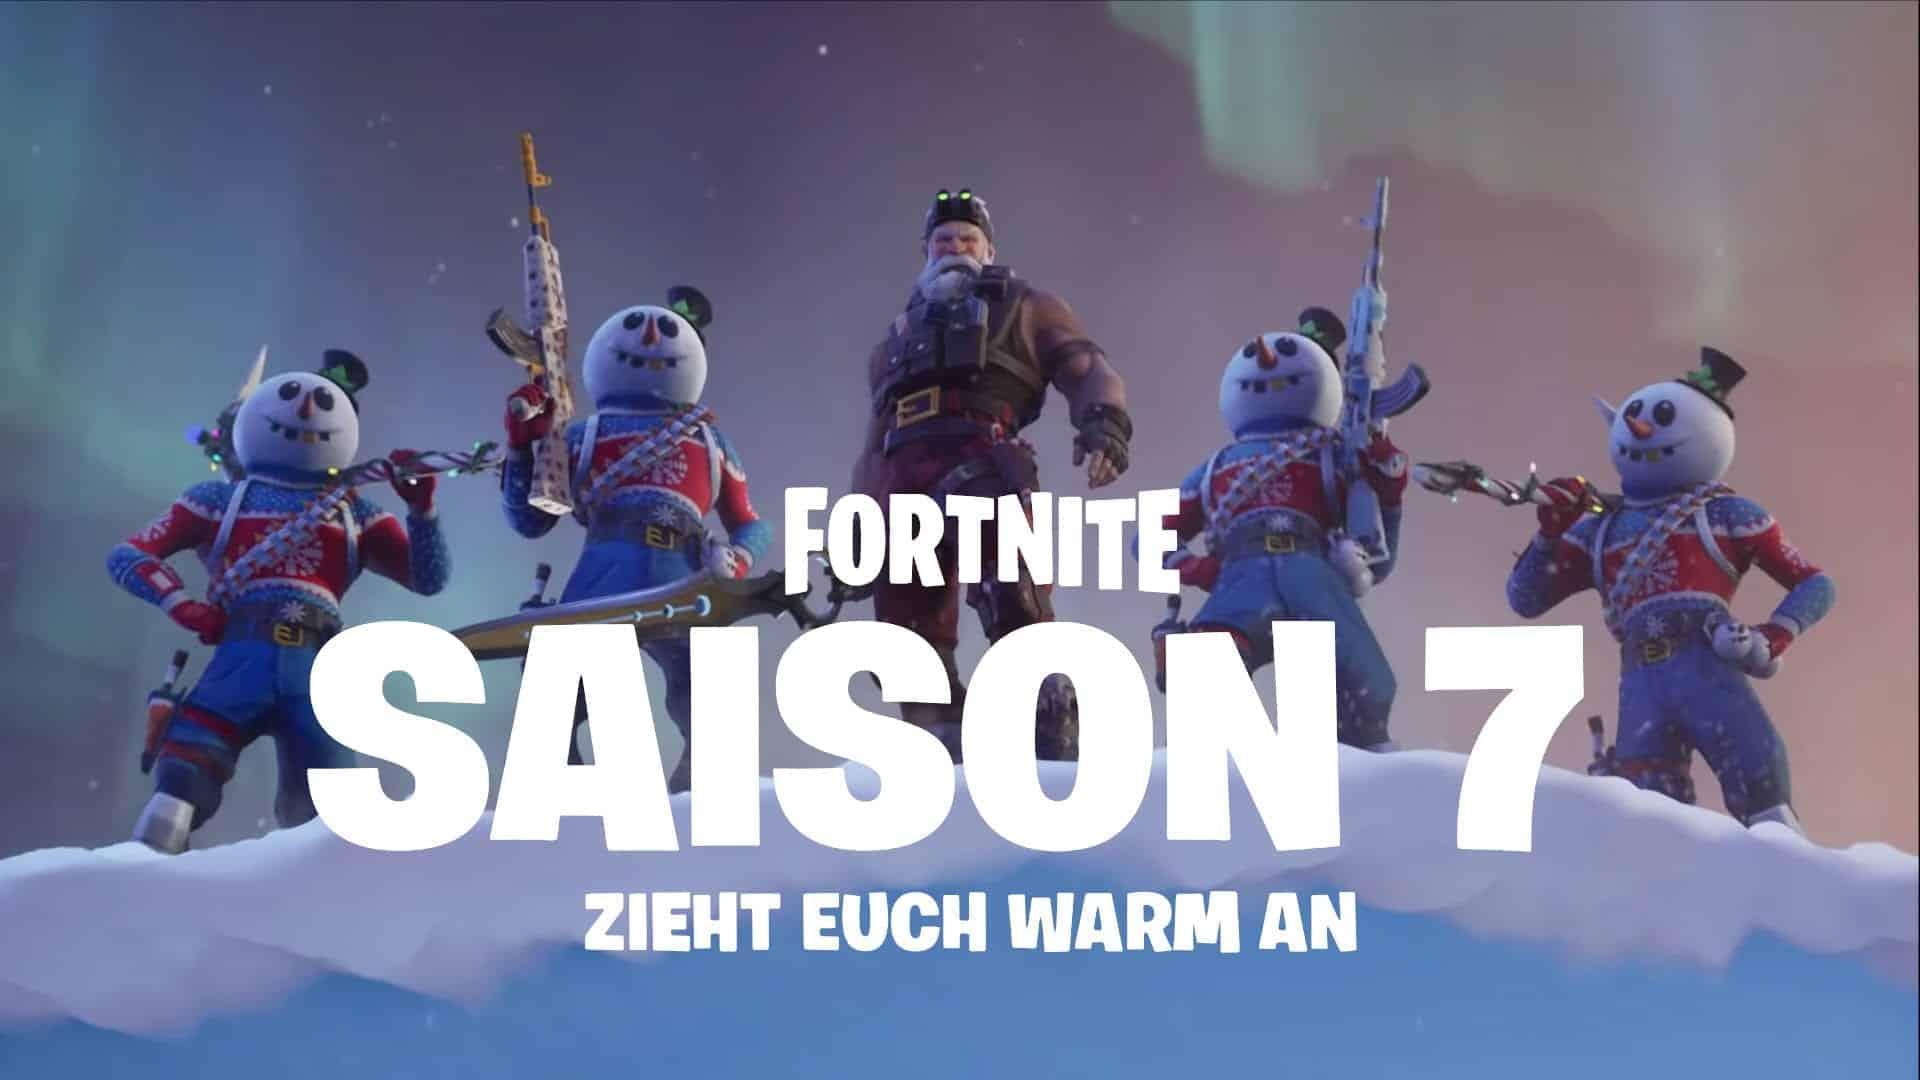 Fortnite Season 7 Ist Da Zieht Euch Warm An Gaming Grounds De